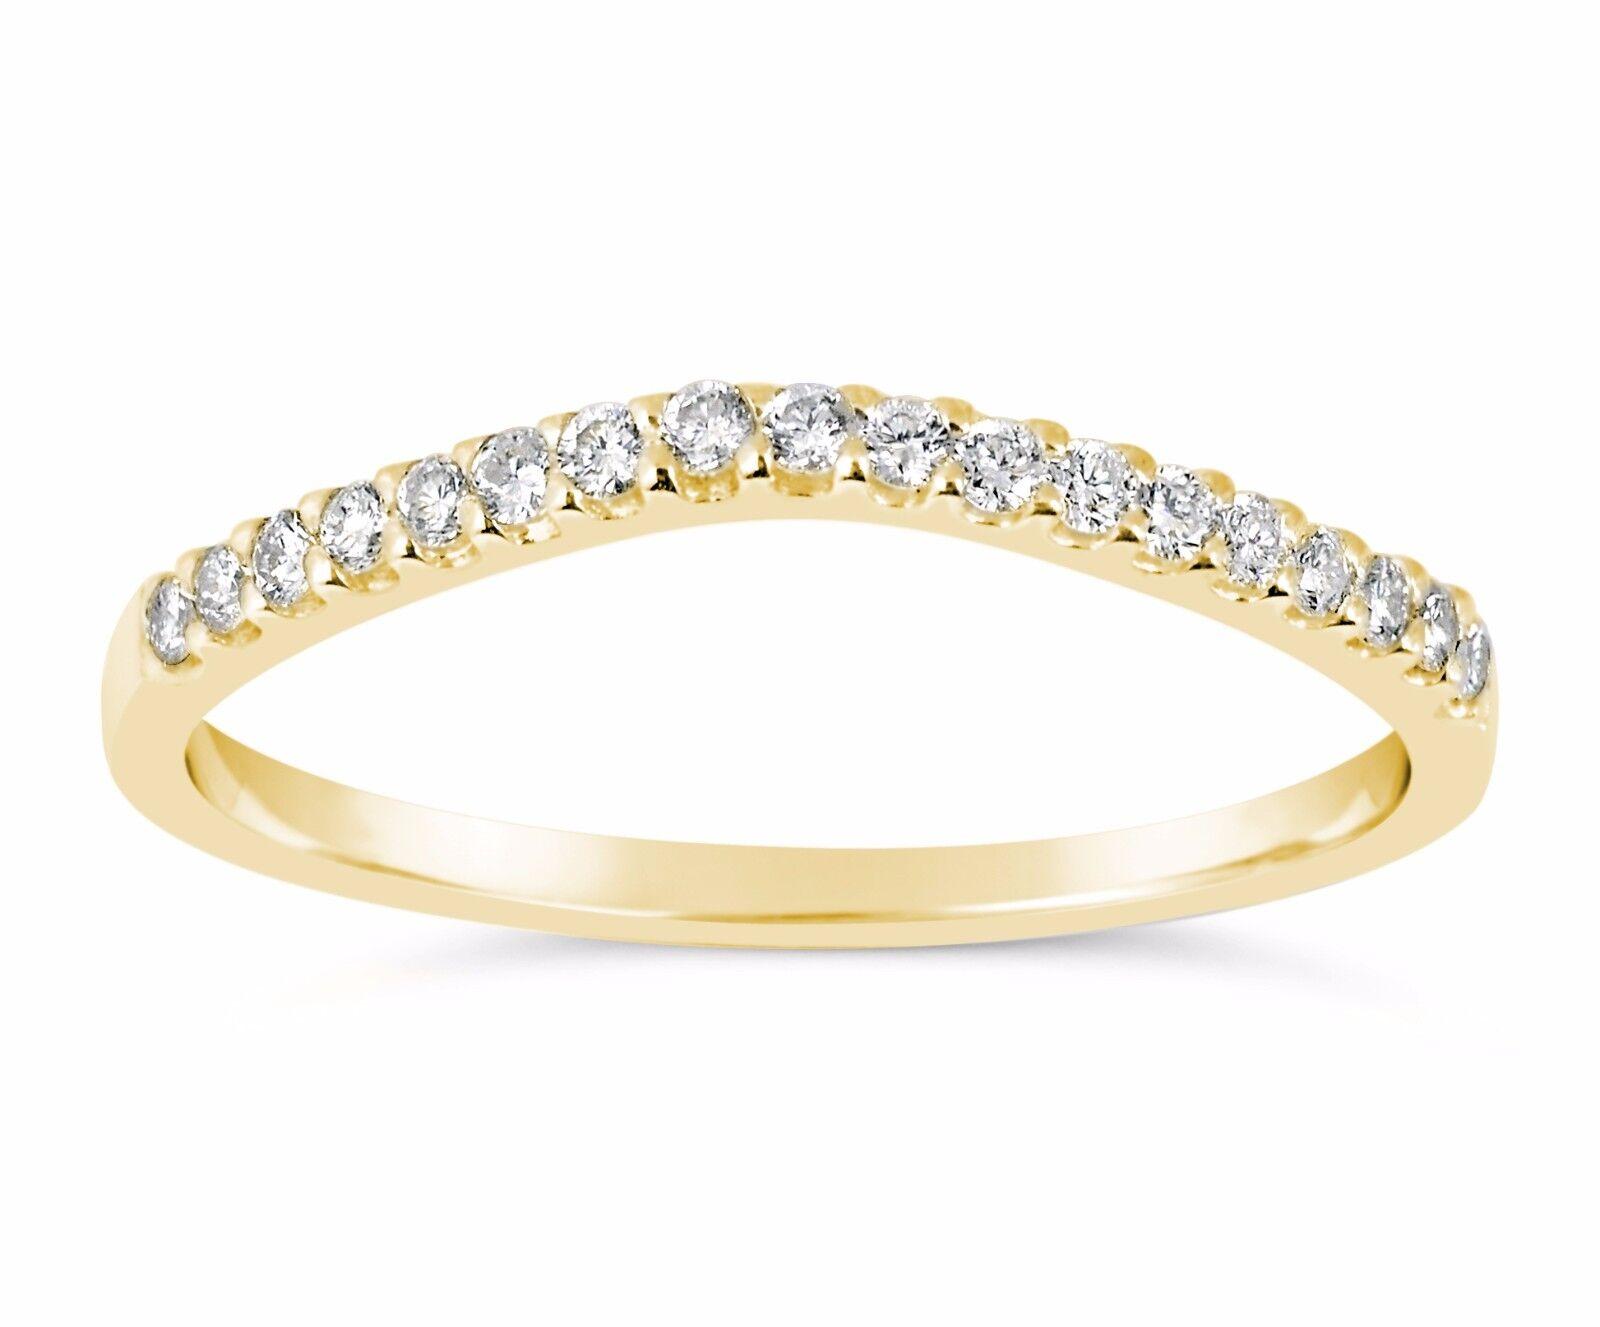 14k Yellow Gold Simulated Diamond Wedding Band Ring Curve...